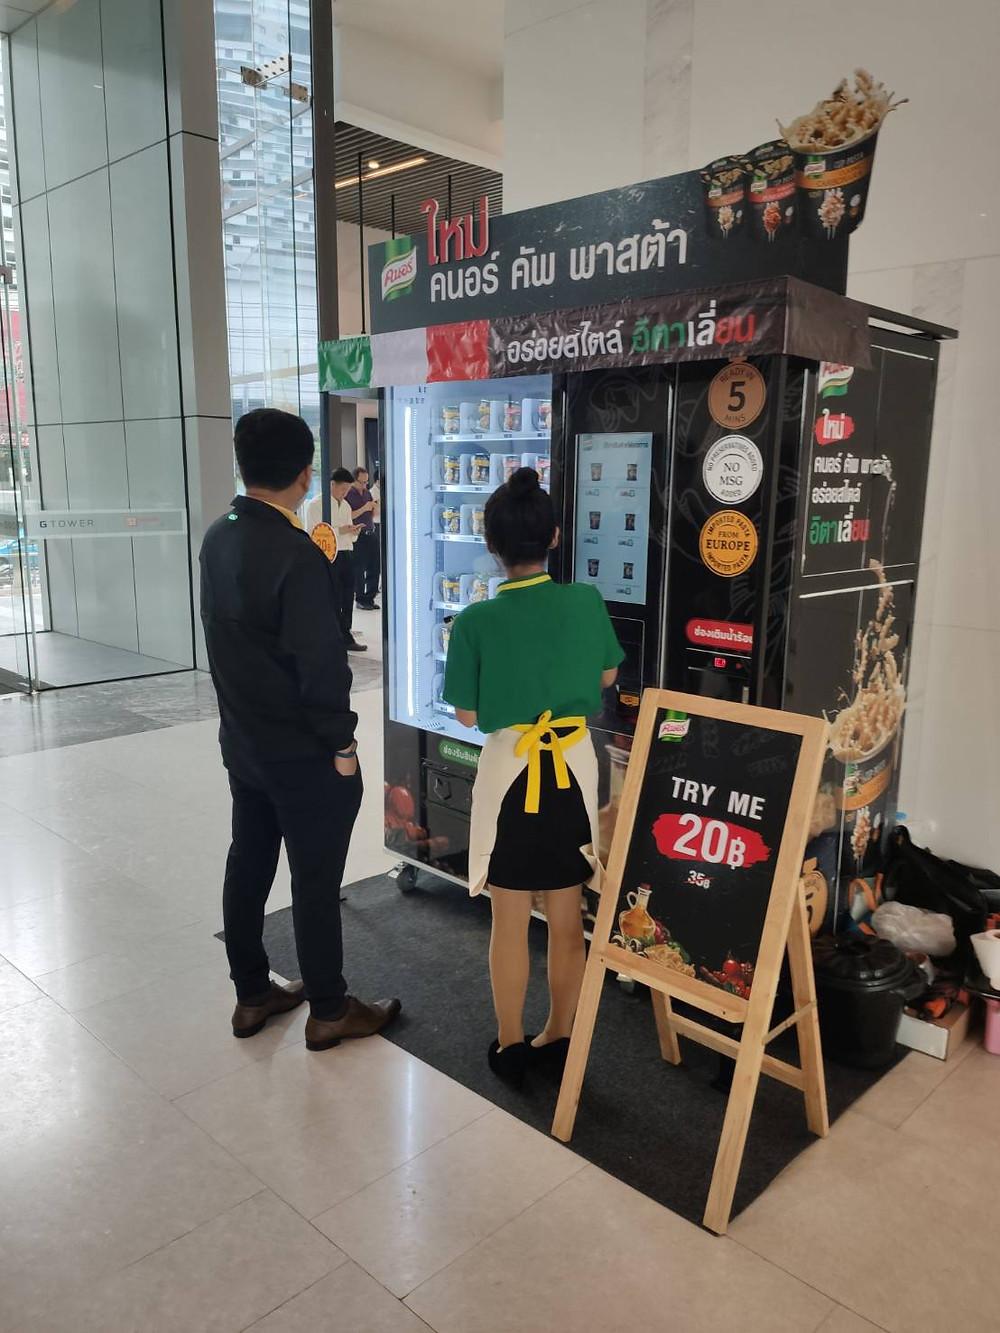 Knorr cup pasta vending machine